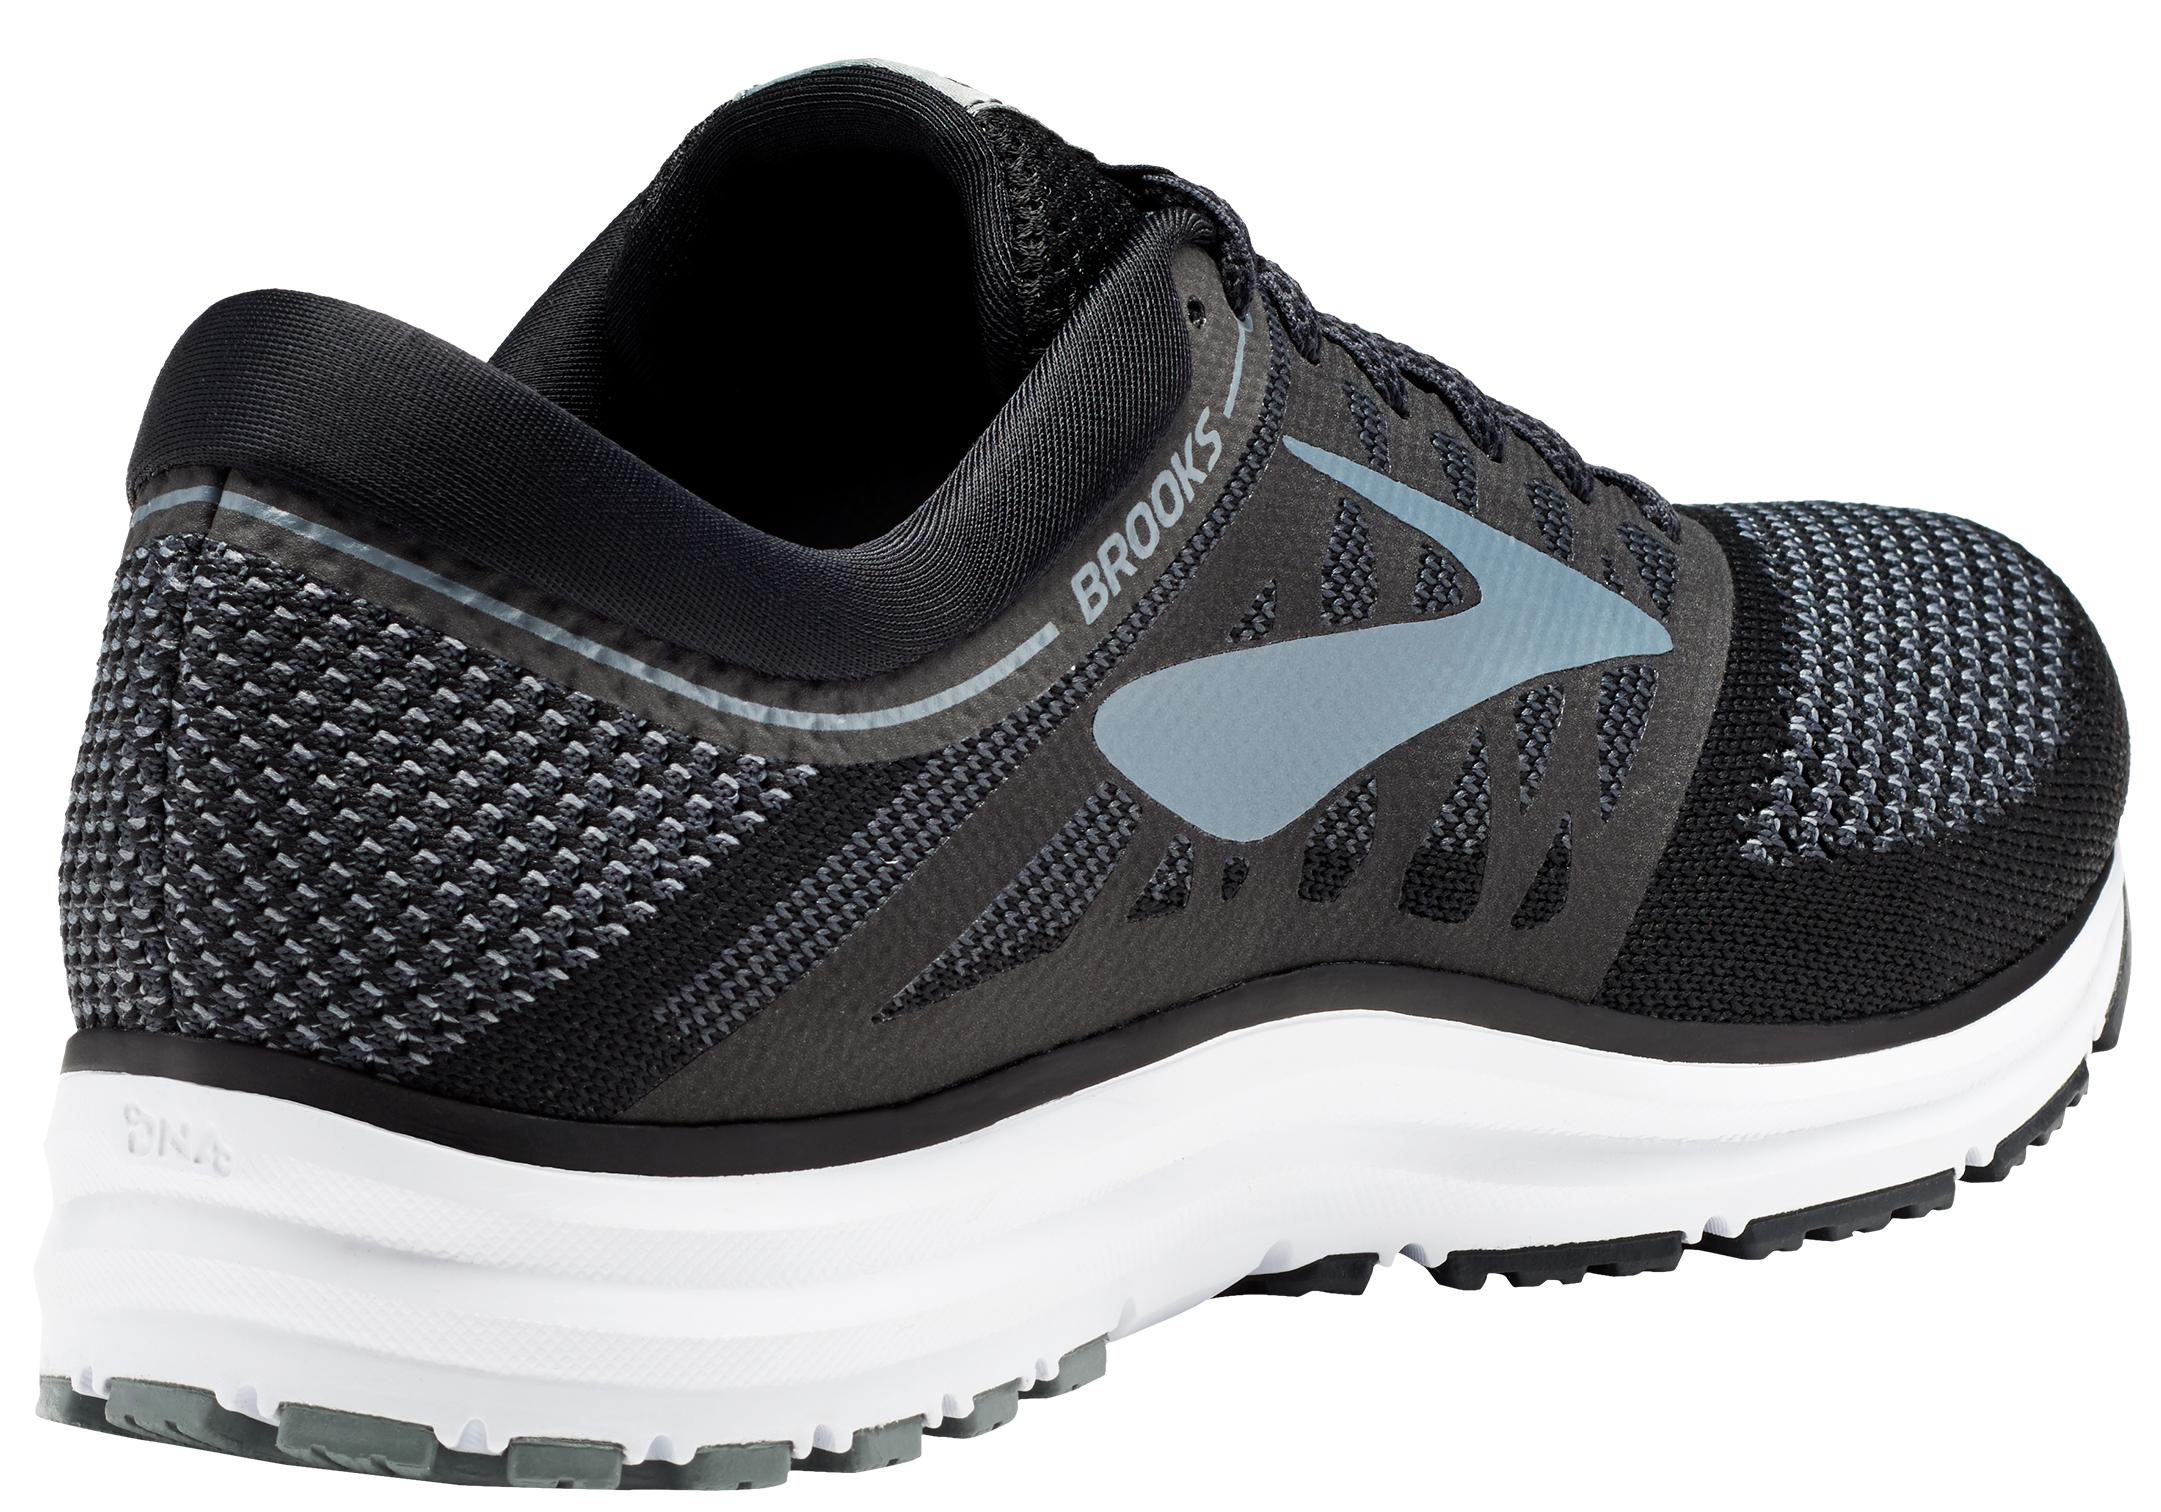 a189c8a63e7 Brooks Revel Road Running Shoes - Men s